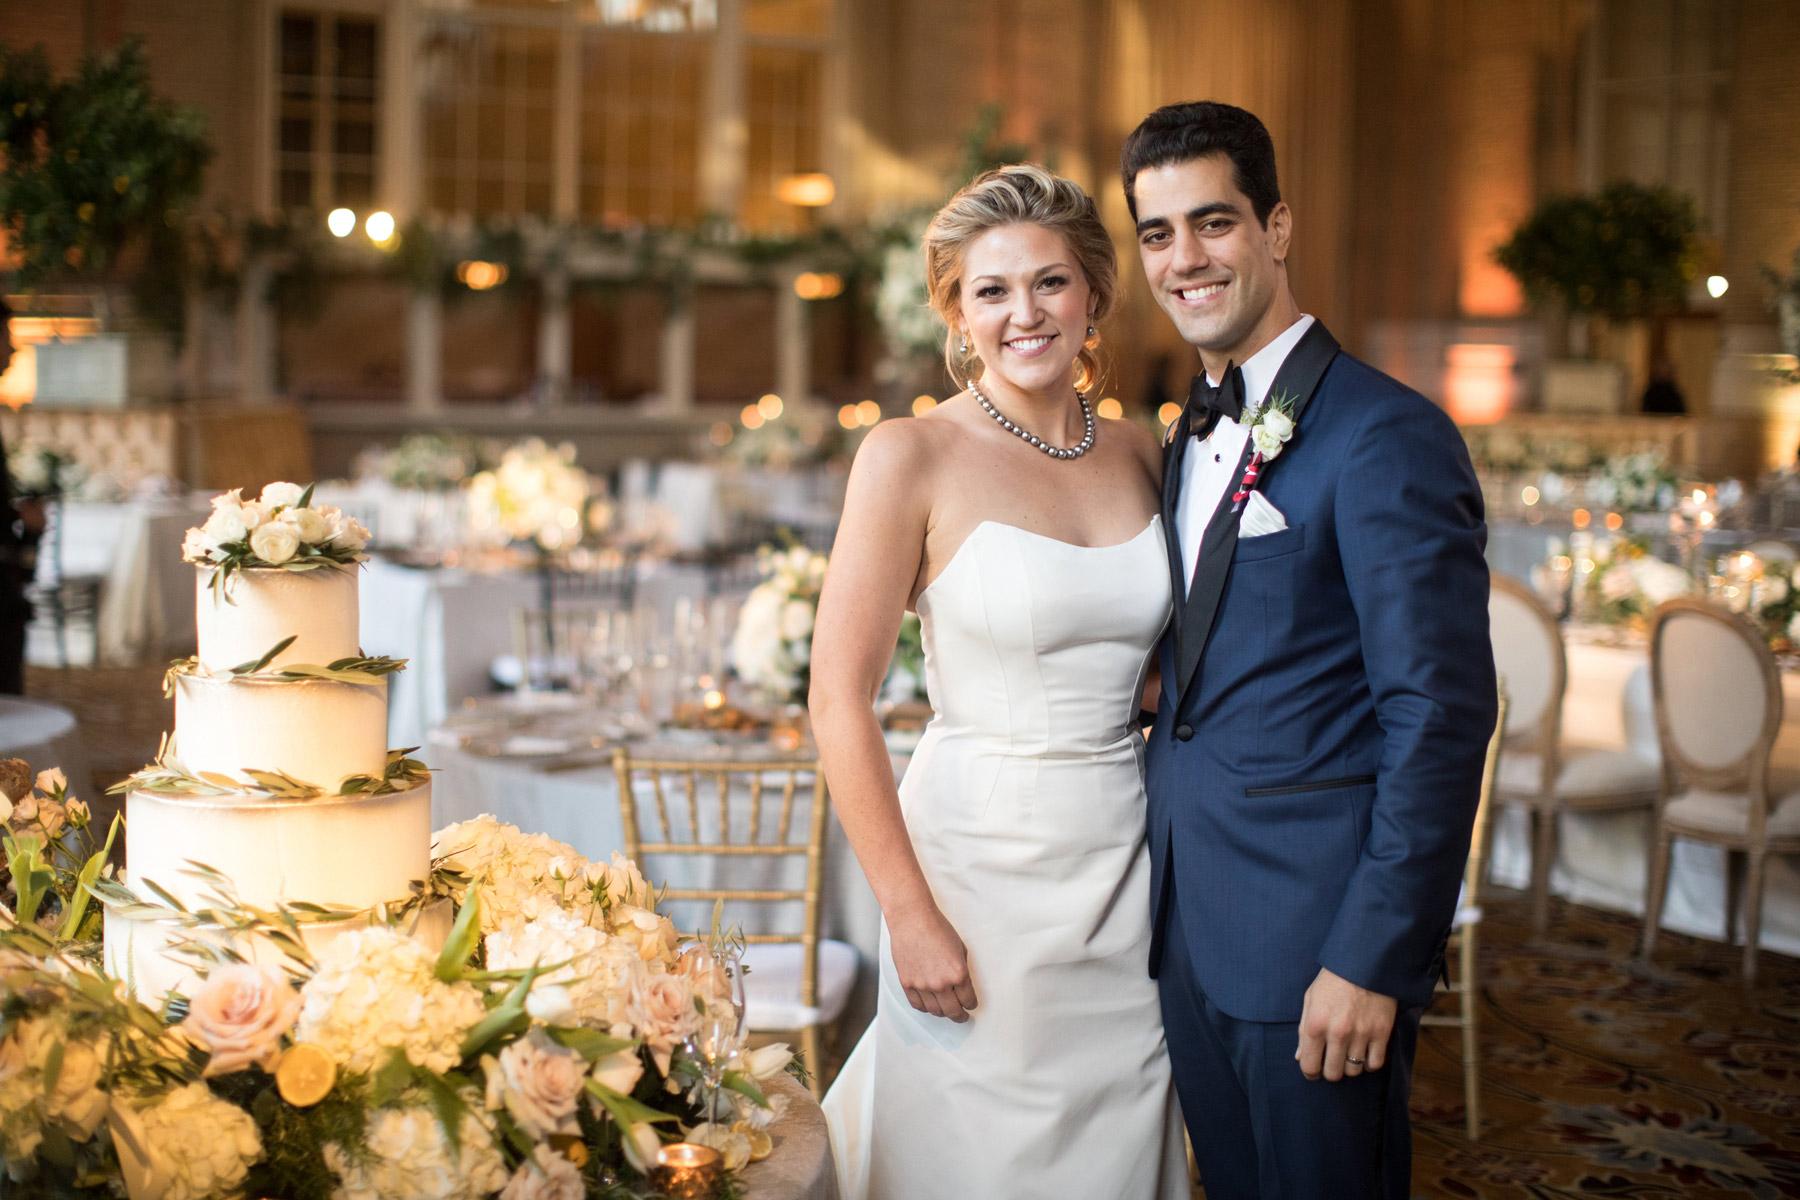 Sargon Daniel and Rachel Larson's Wedding at Union Station